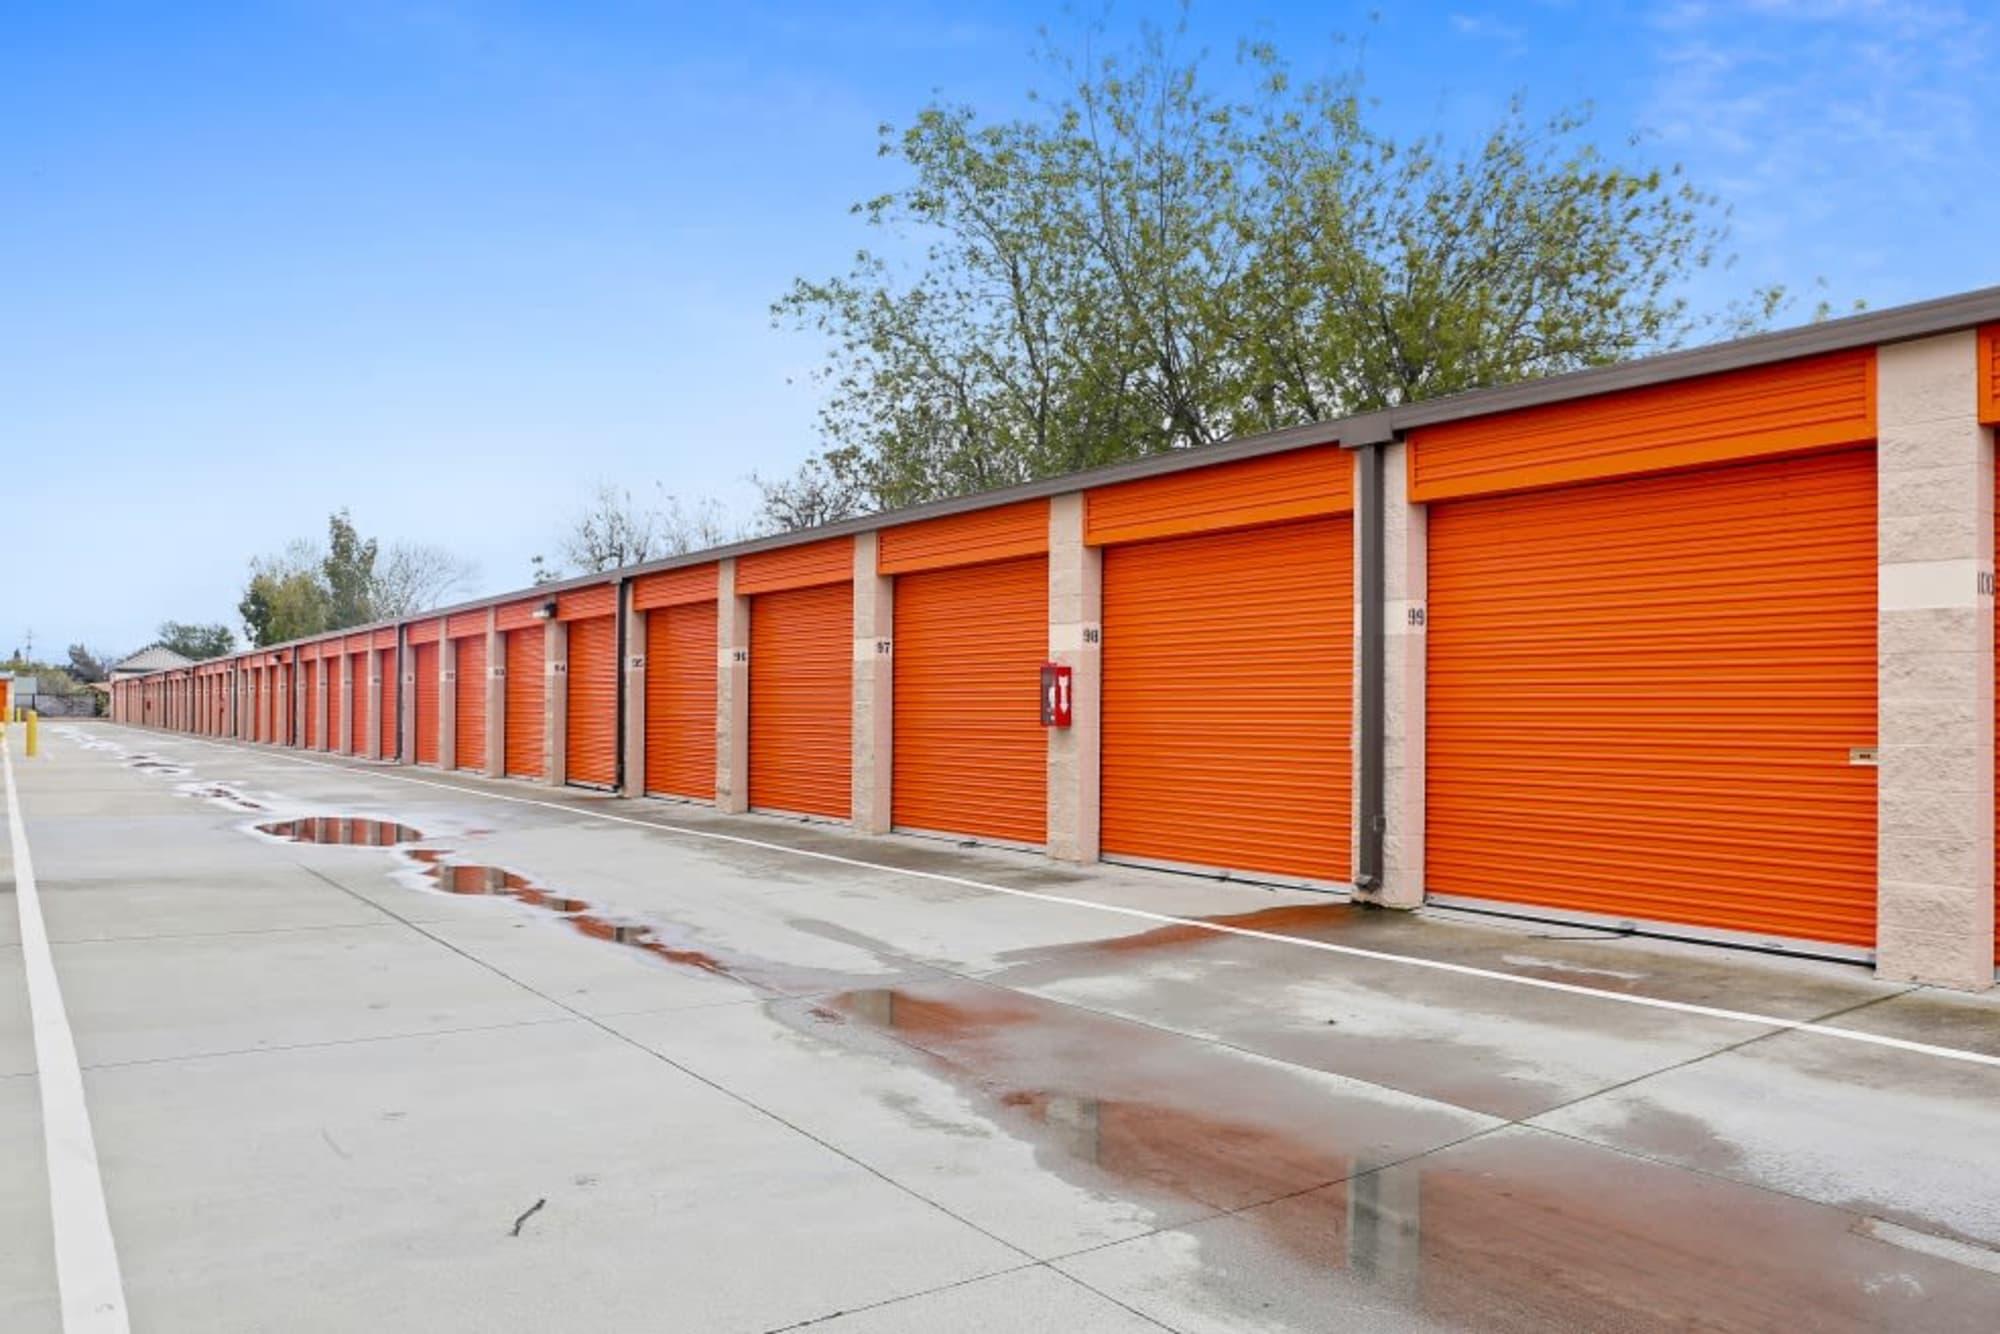 Exterior units at A-1 Self Storage